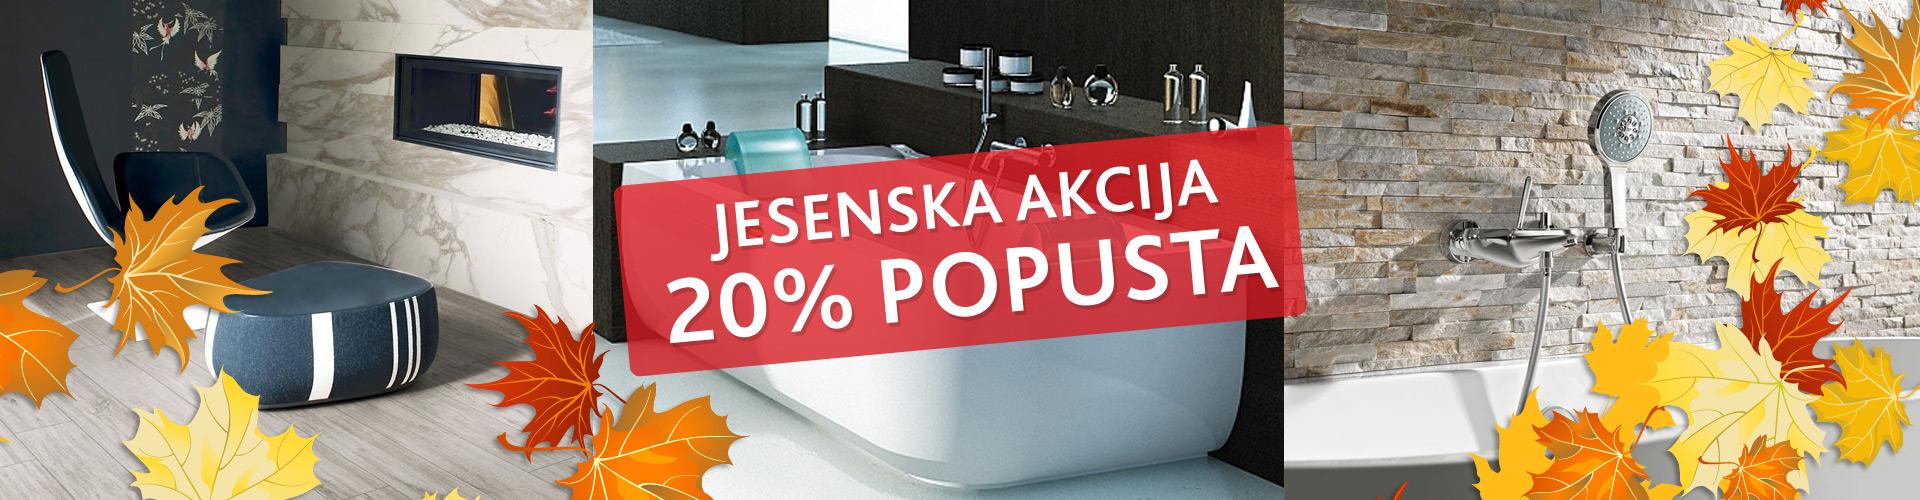 http://www.kimicommerce.hr/Repository/Banners/jesenskaAkcija-20-190916.jpg